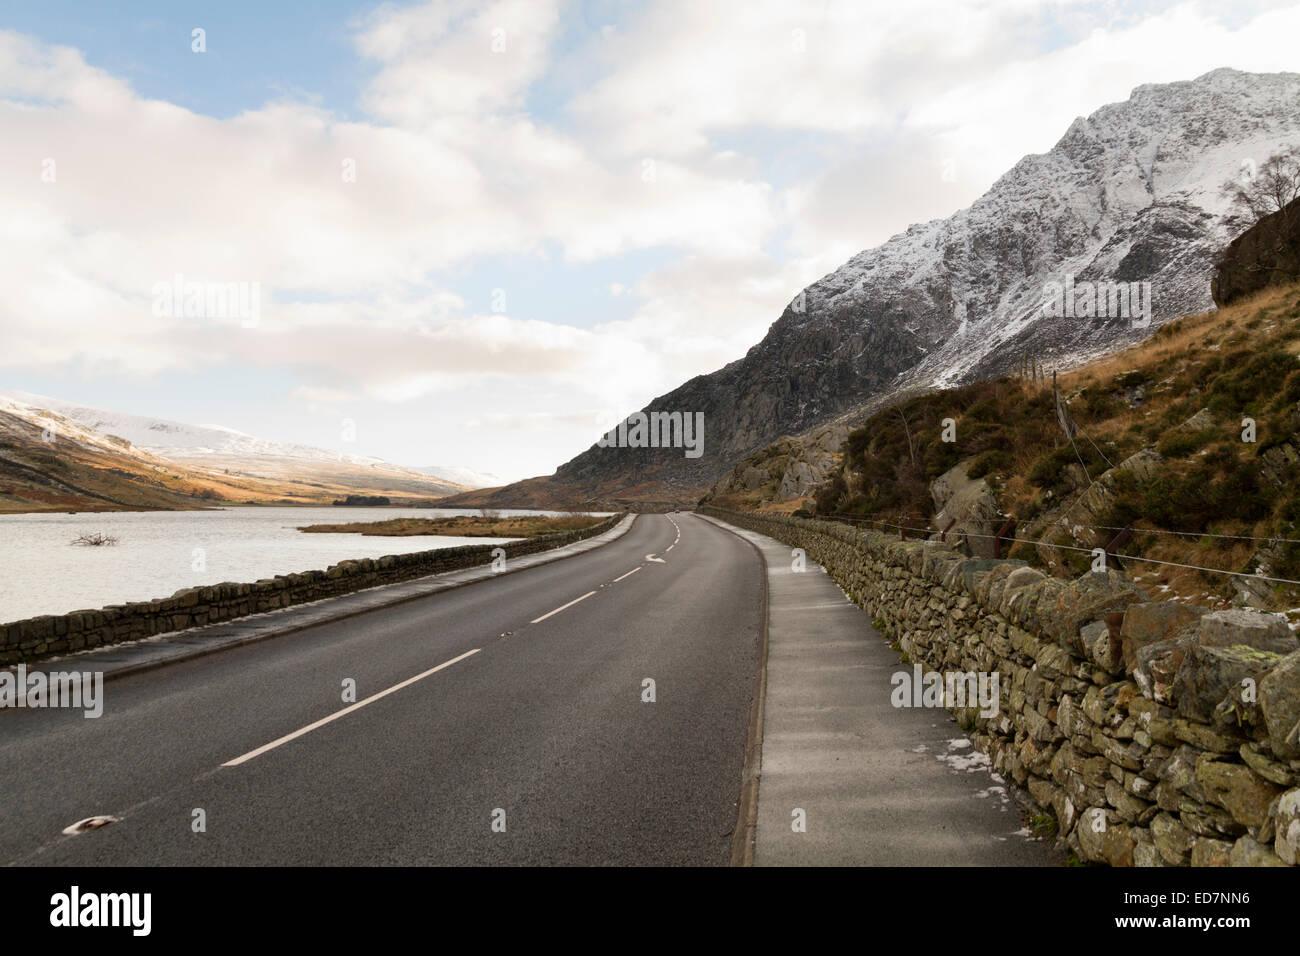 The A5 road running alongside Llyn Ogwen in North Wales - Stock Image